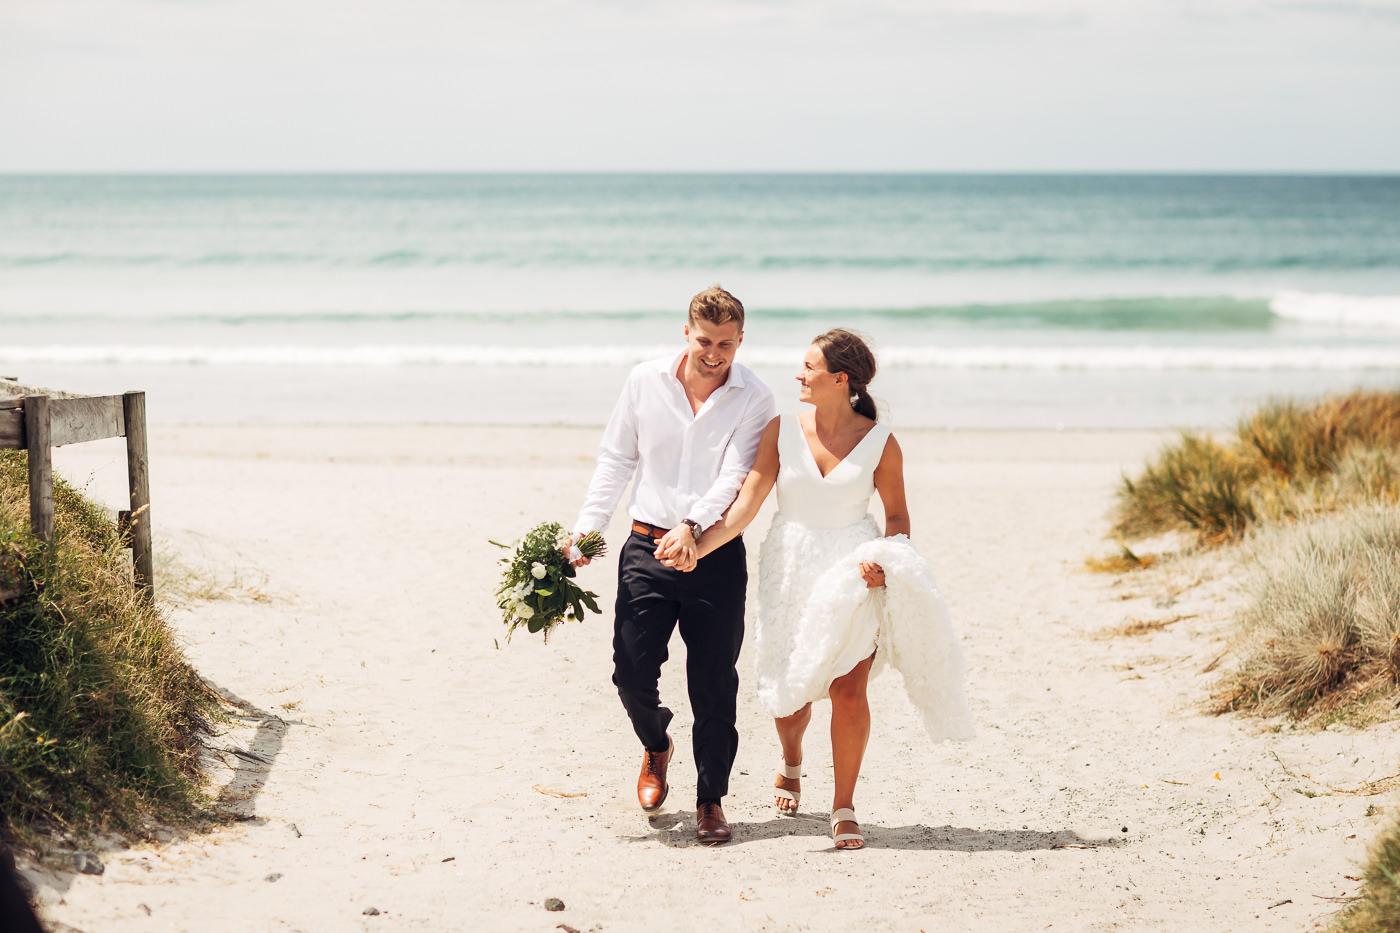 Anne-Hilde & Pieter - januarbryllup i slående vakre Tauranga, New Zealand Bryllupsfotograf New Zealand strand 11 Brudepar